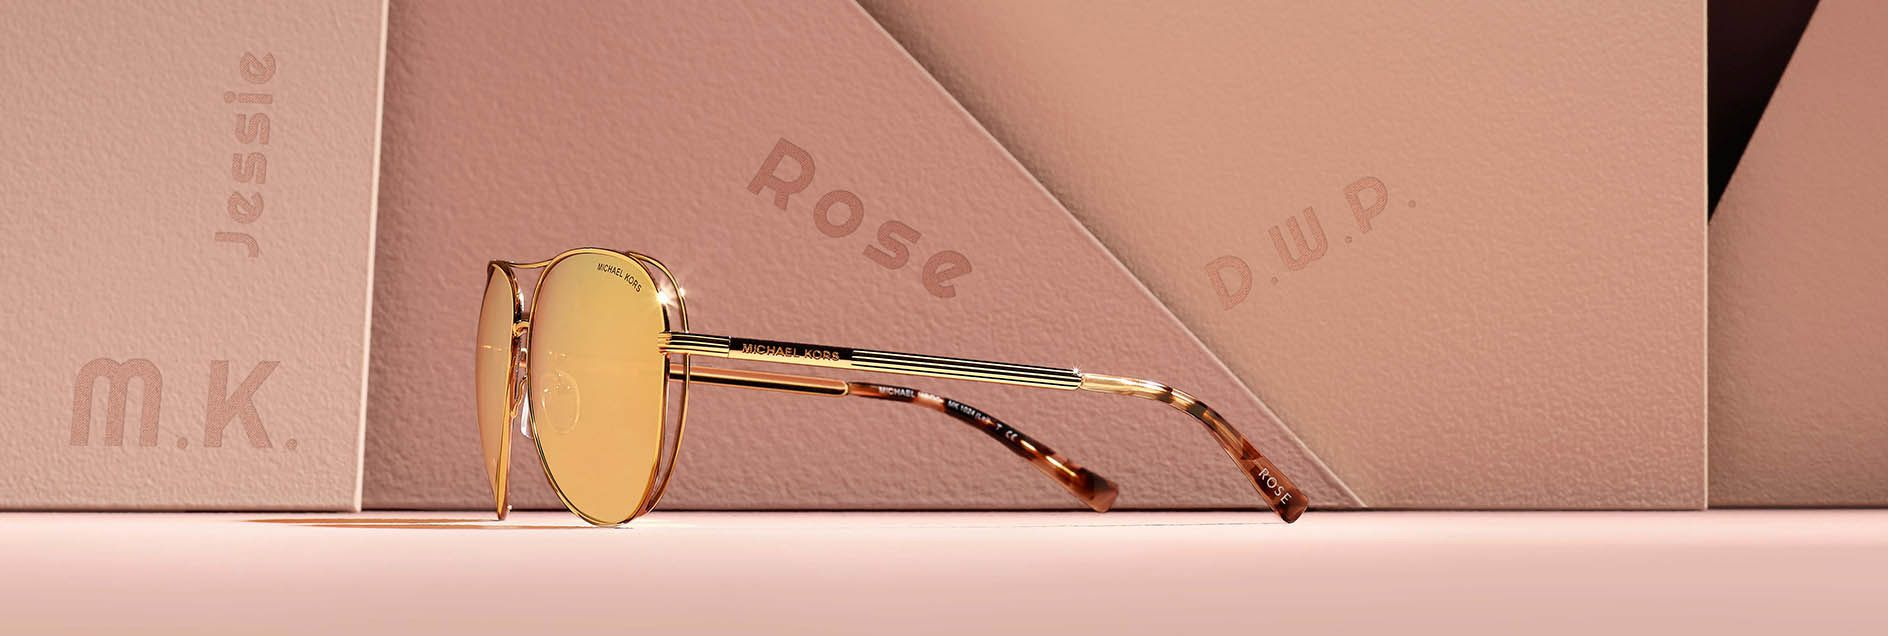 f2eac89ea57 Michael Kors Women s Sunglasses Collection